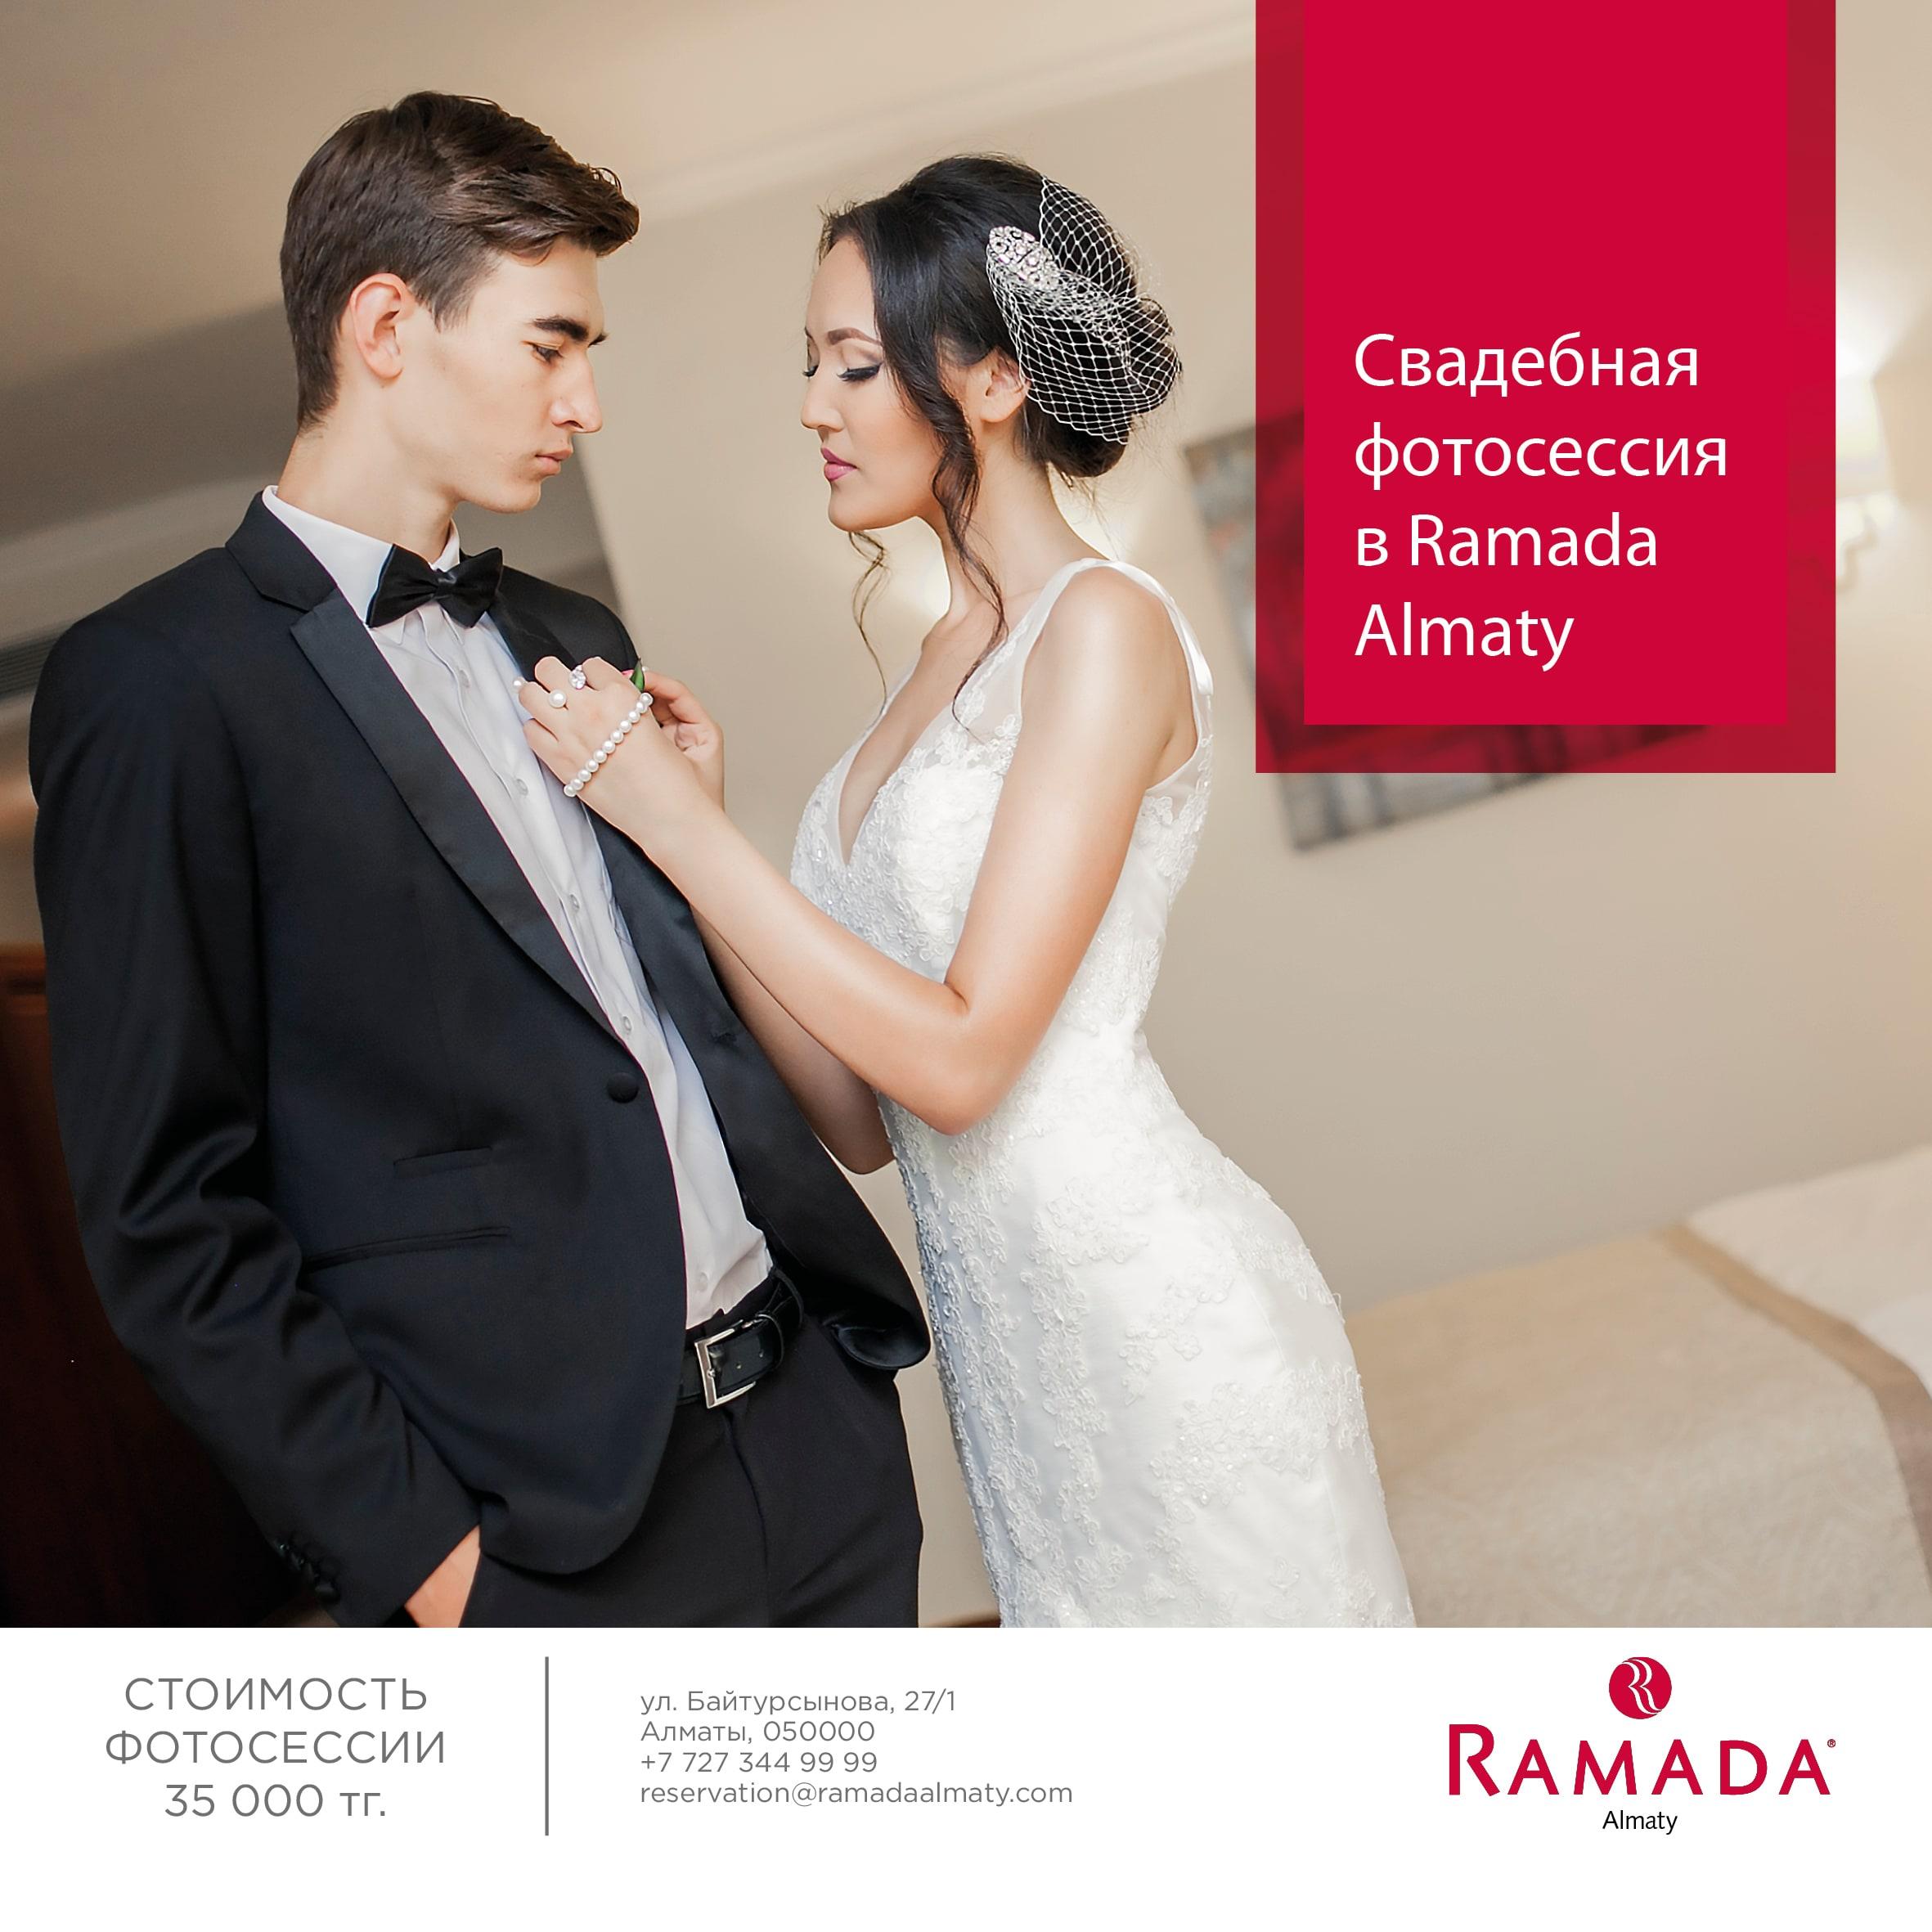 Ramada_post - 18-04-18 ru -1-min